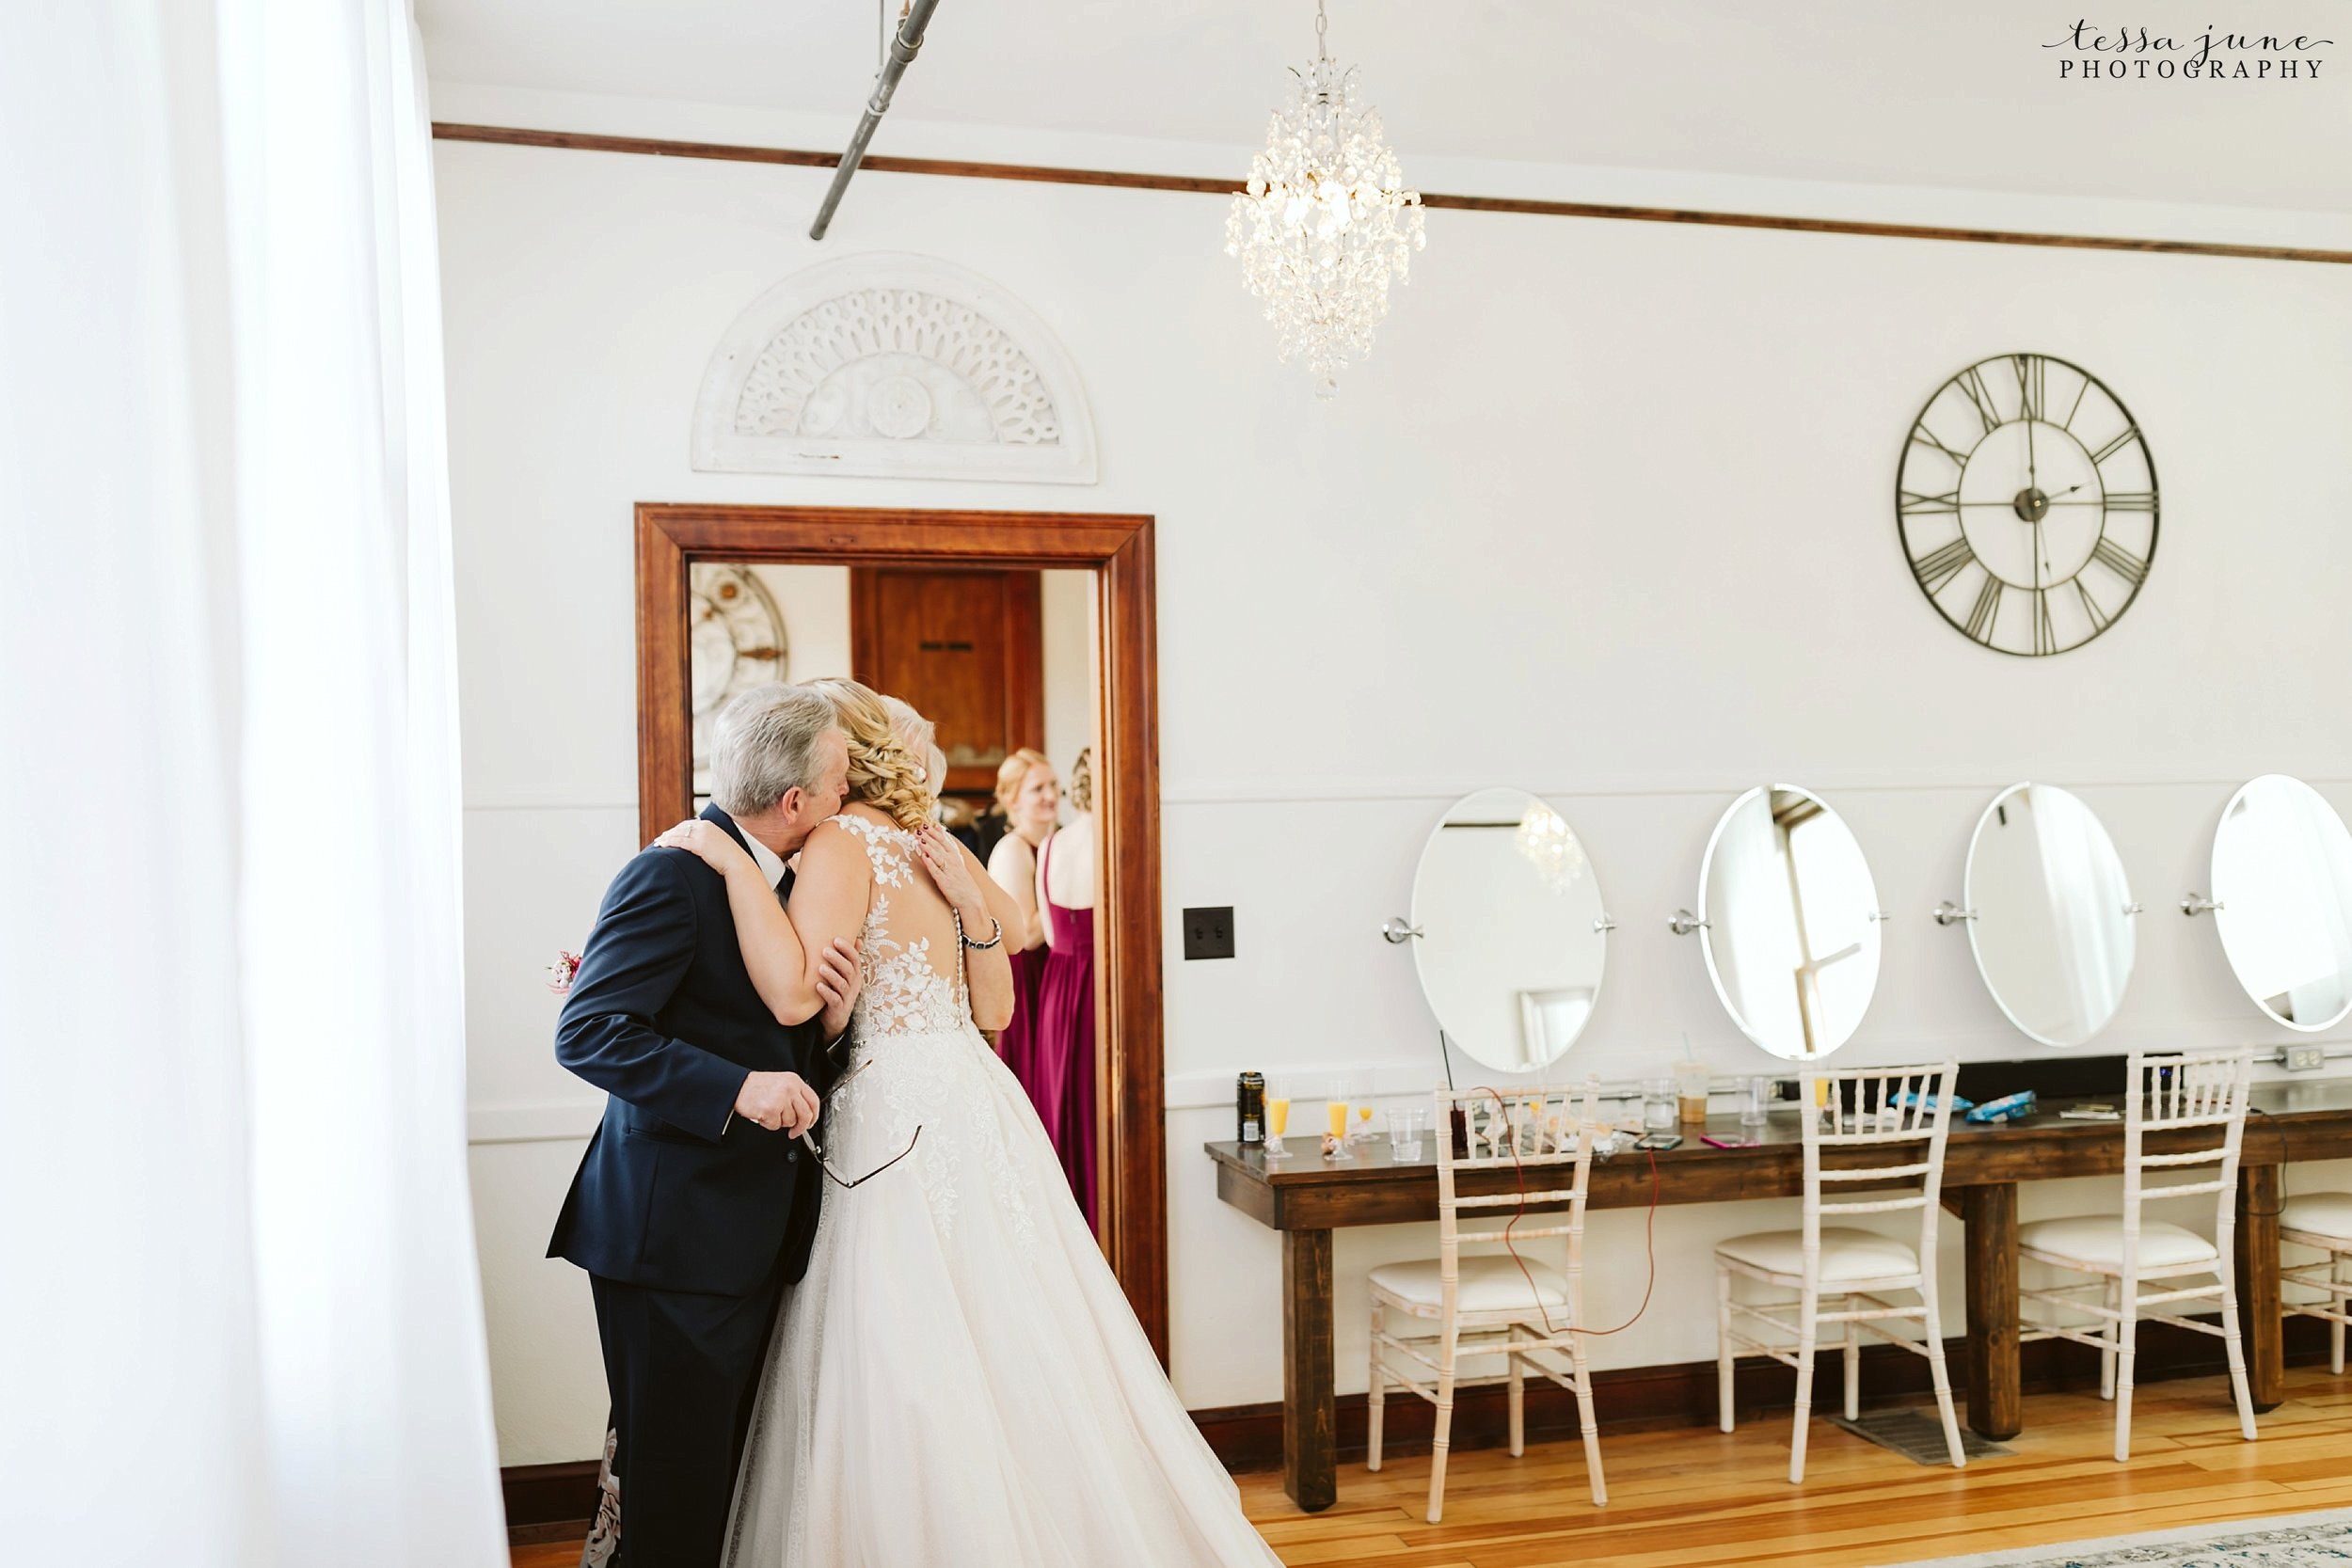 the-3-ten-event-venue-november-elegant-cozy-wedding-faribault-minnesota-37.jpg